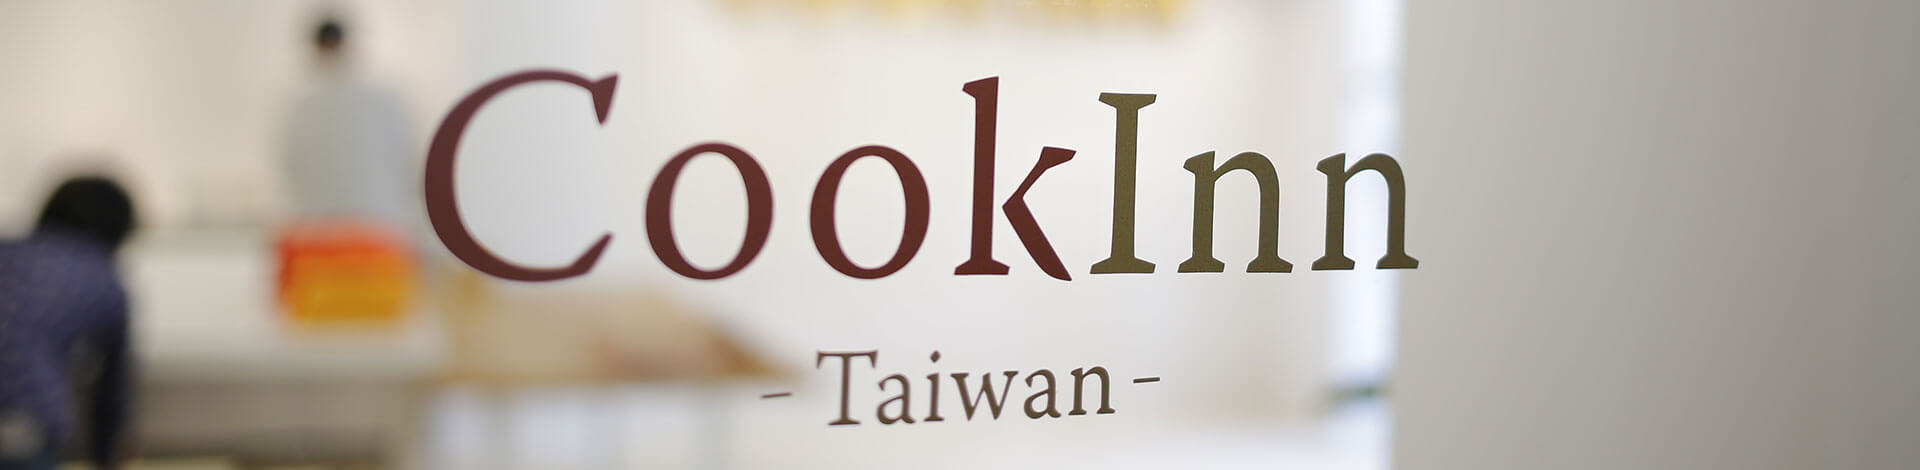 CookInn